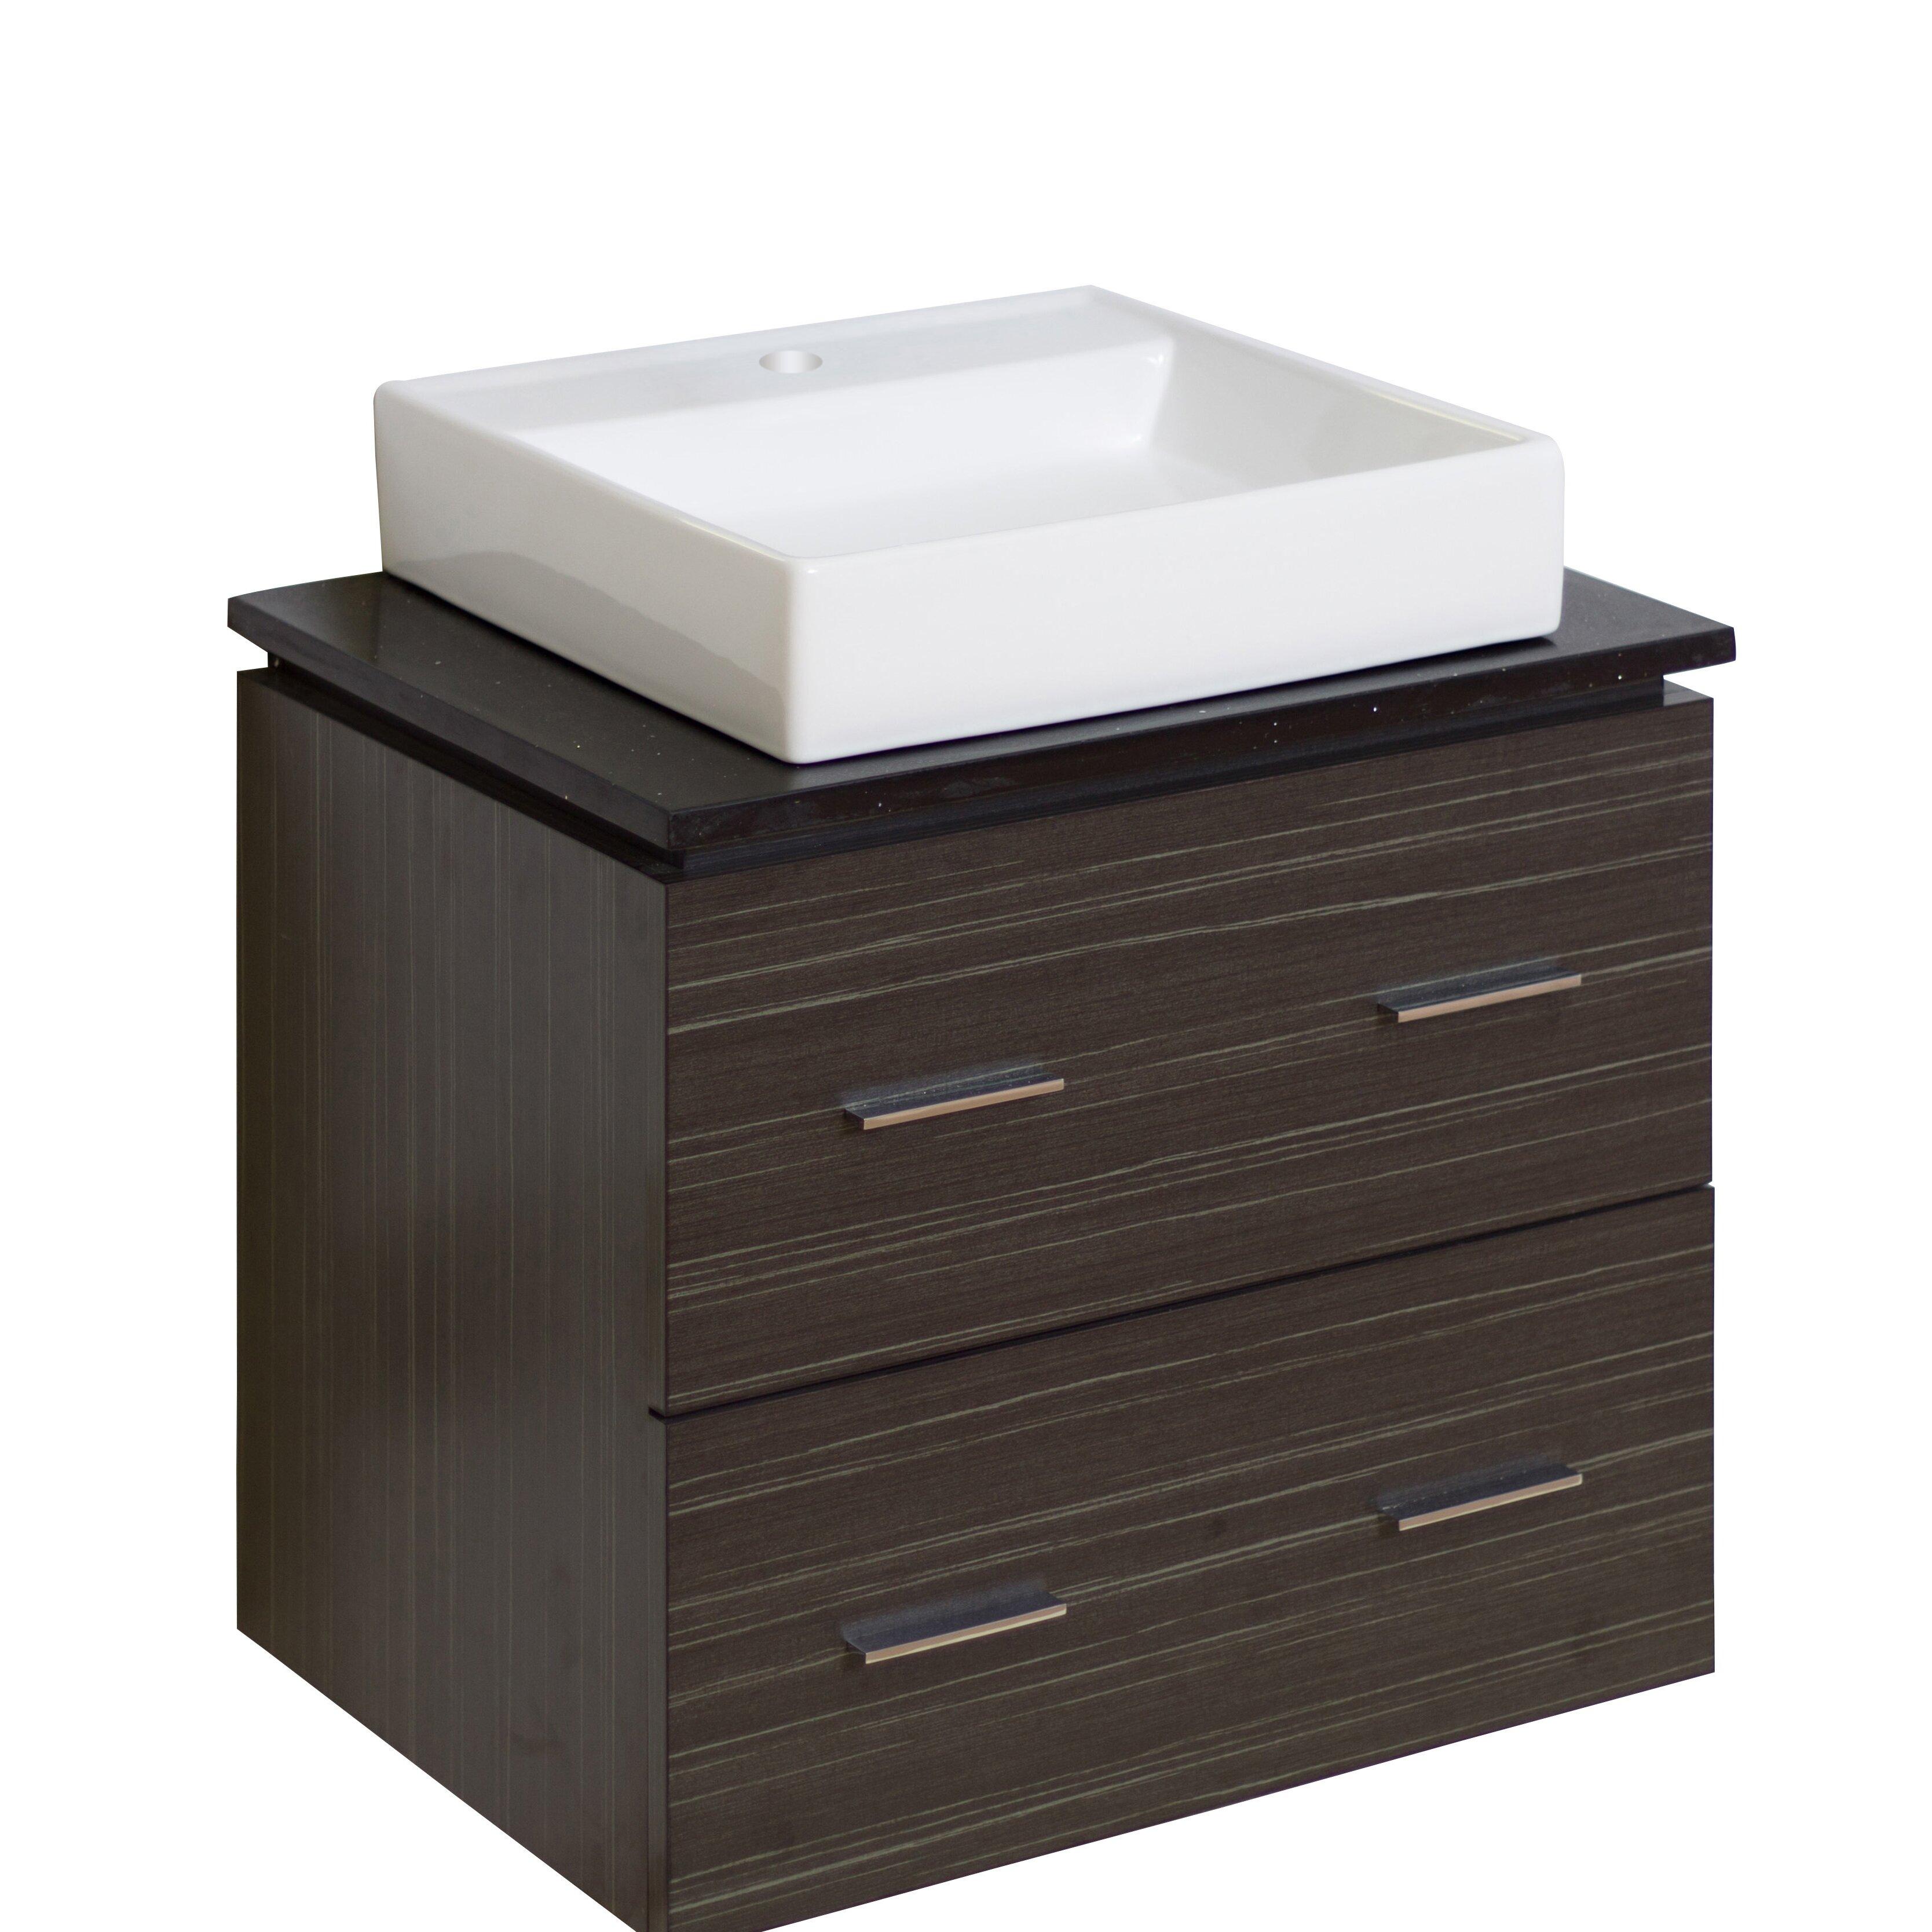 American imaginations 24 single modern wall mount bathroom vanity set reviews wayfair - Linden modern bathroom vanity set ...